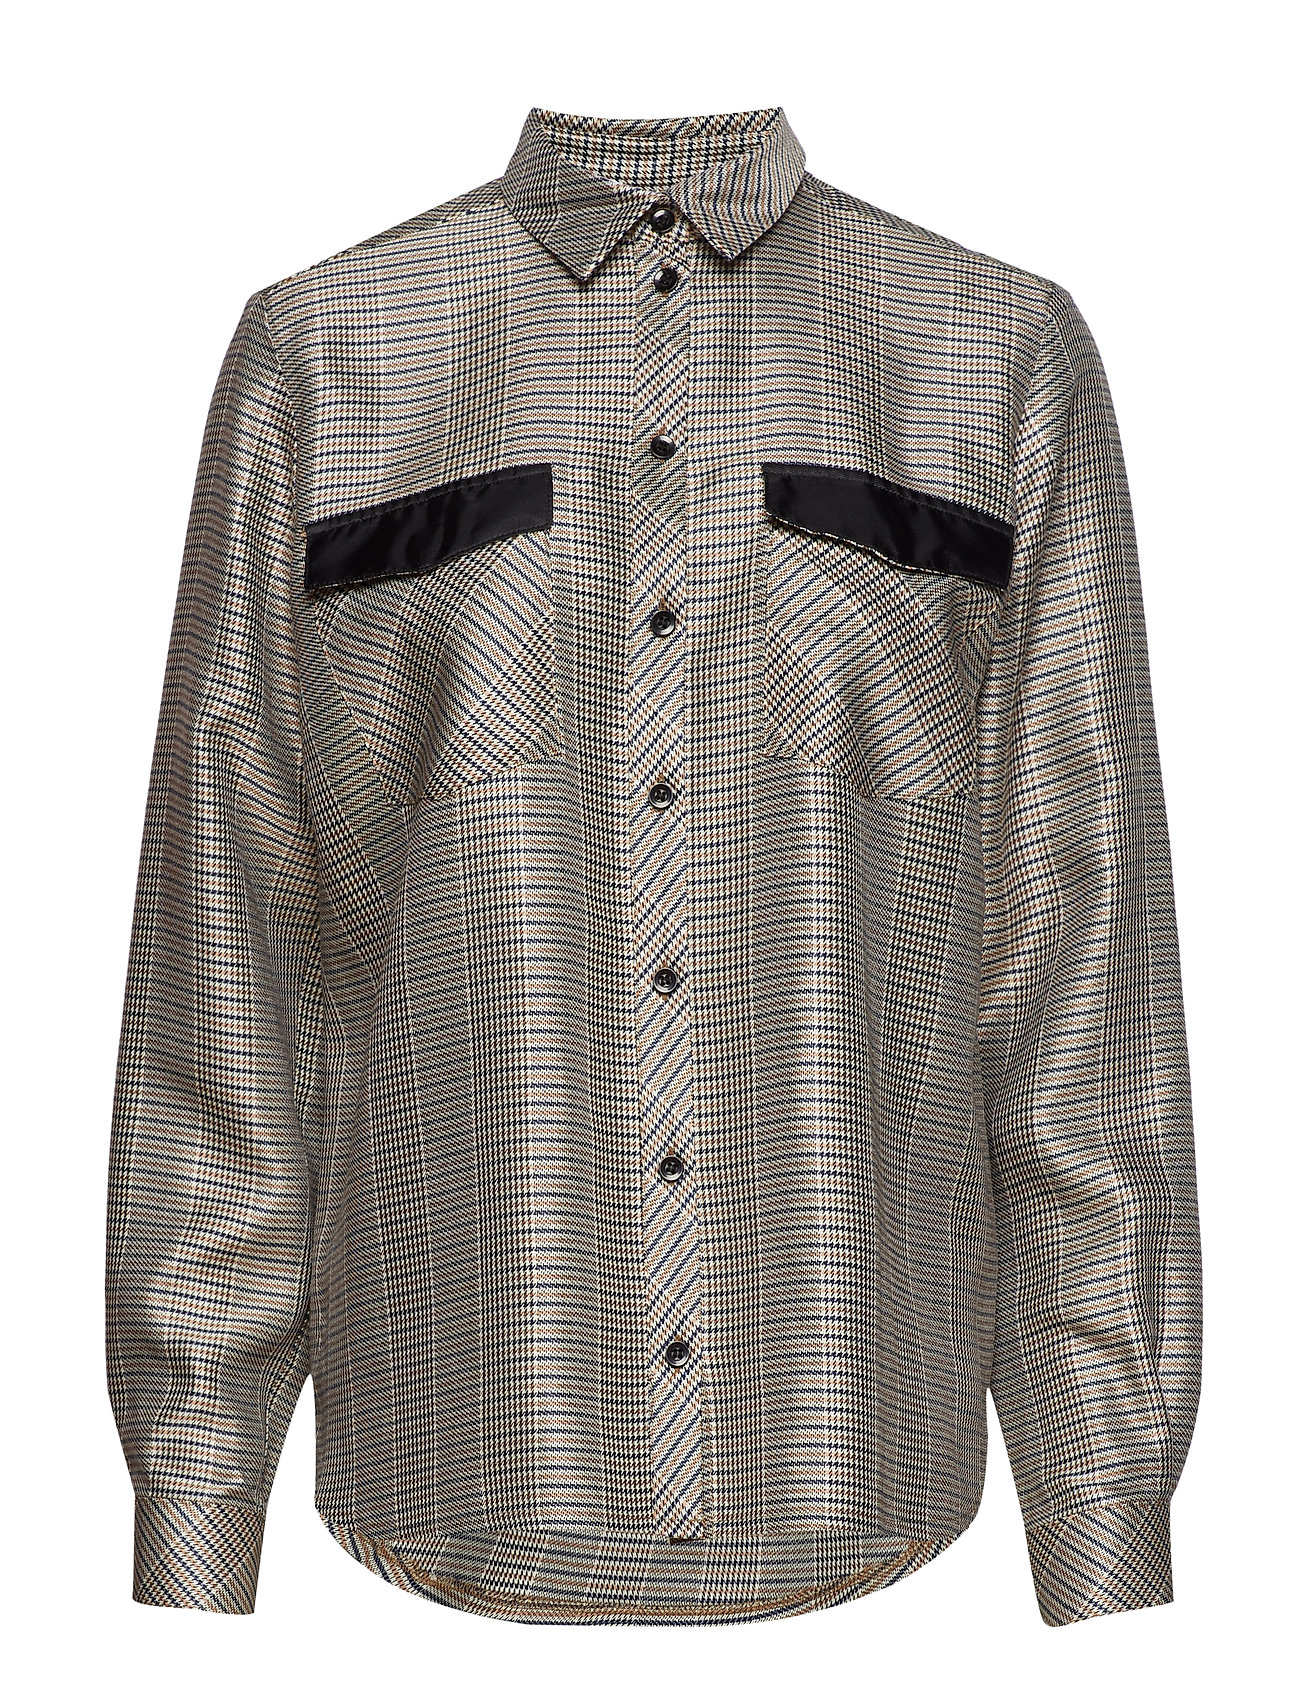 Gestuz Callie shirt SO19 - CHECK